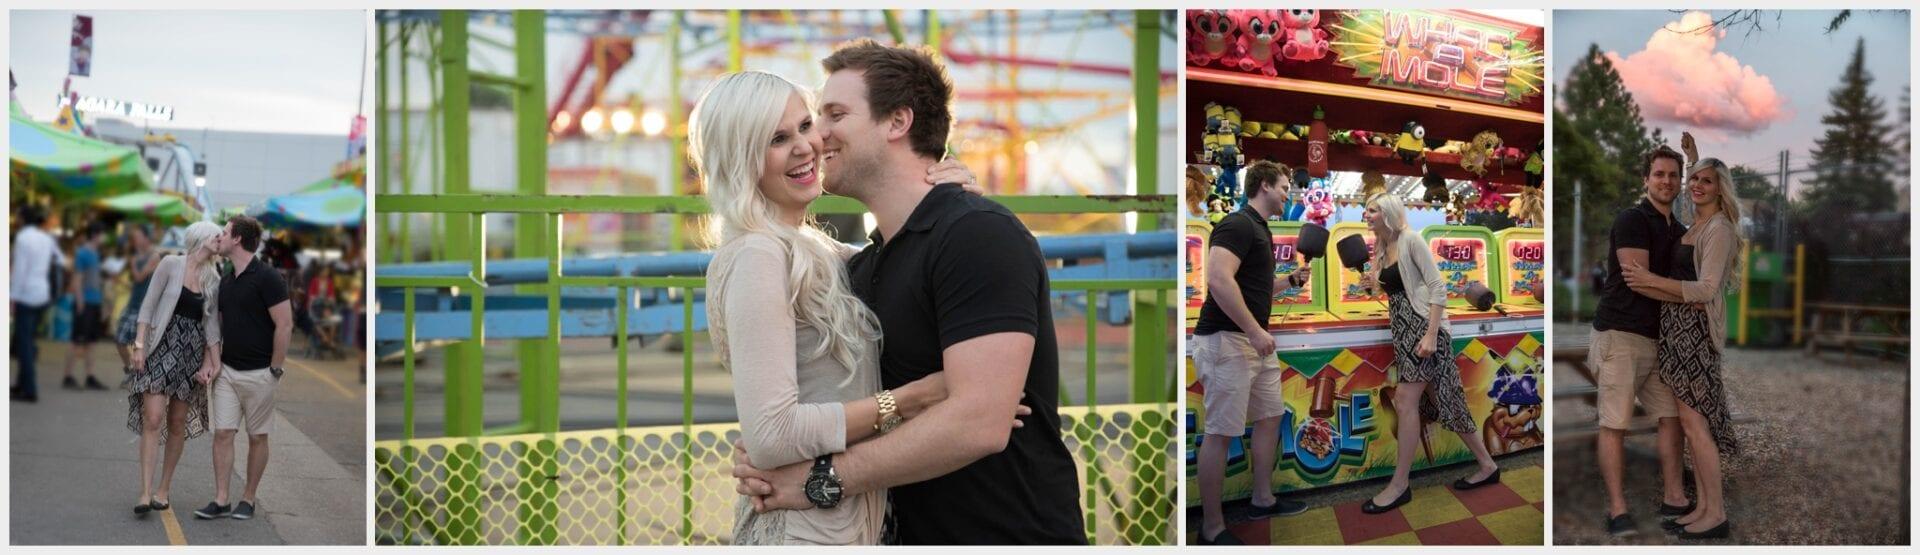 Calgary Fireworks Festival Globalfest collage_0001